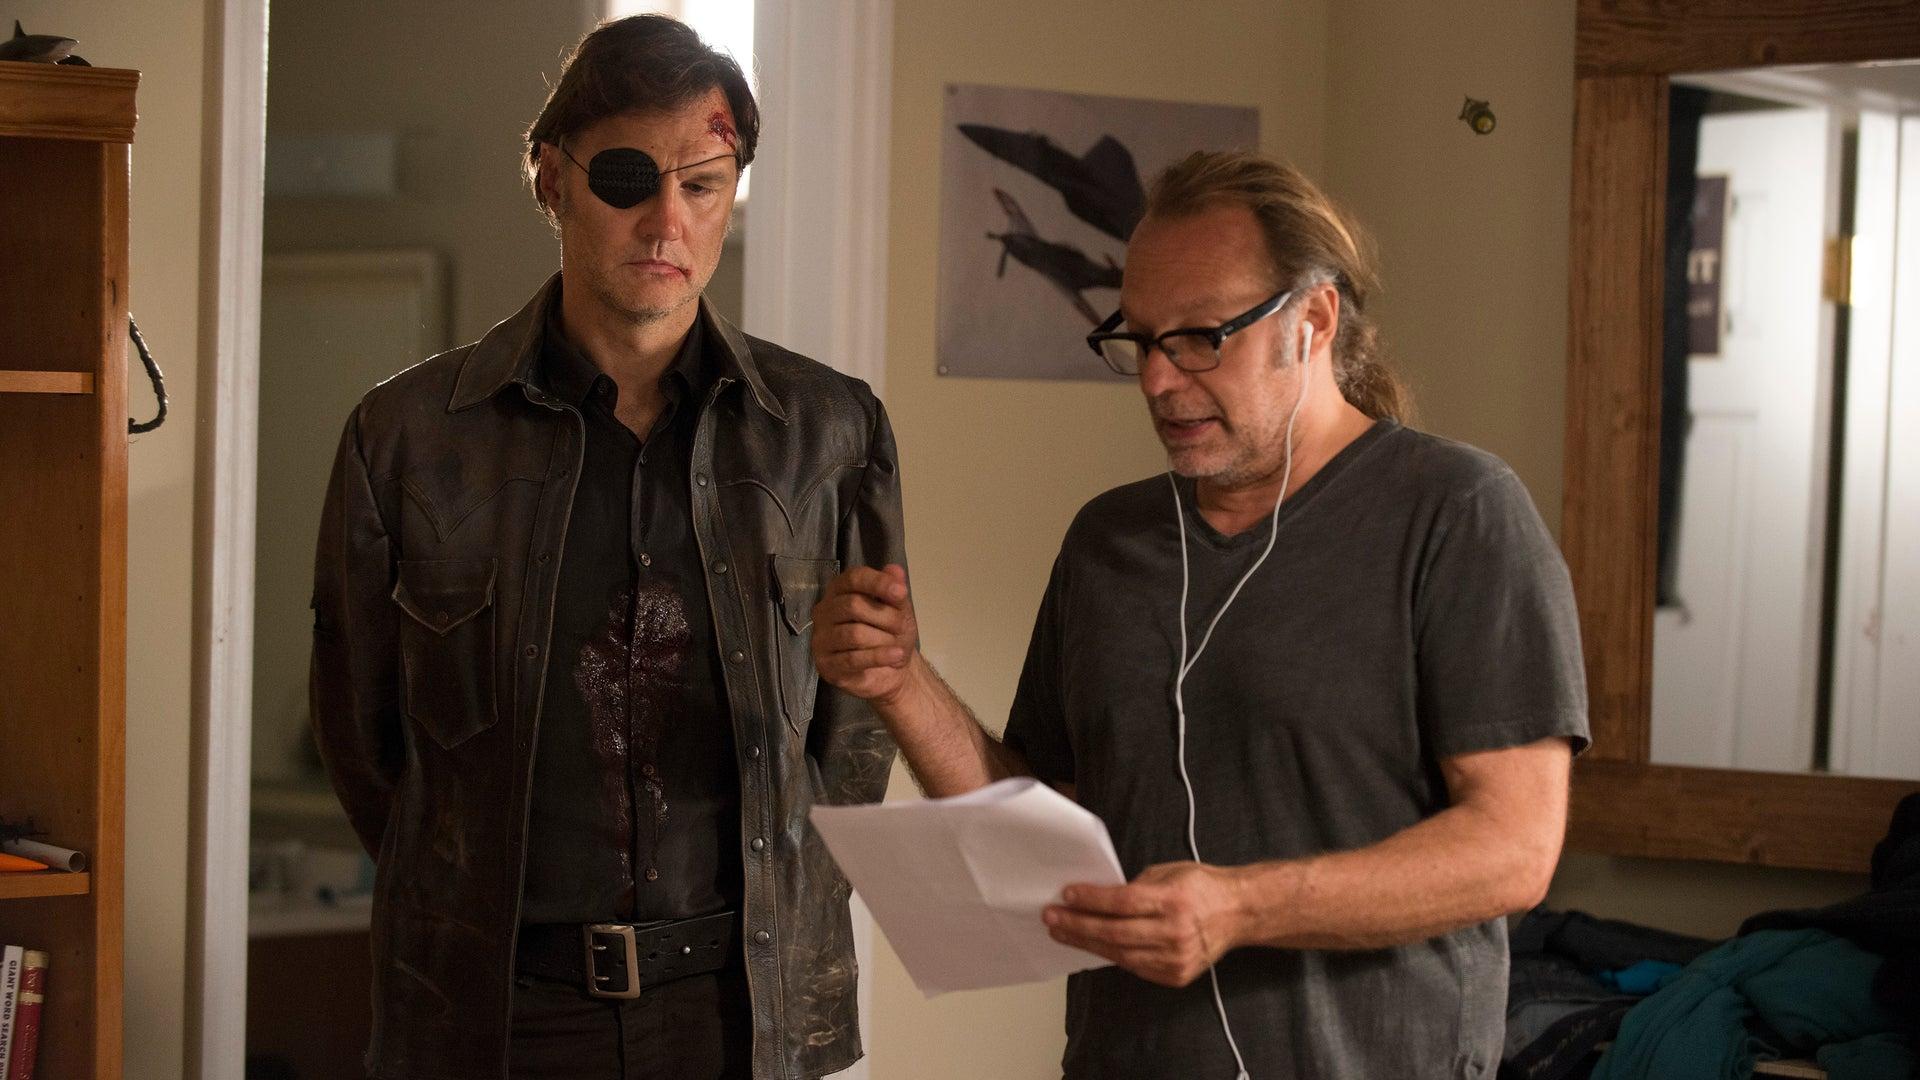 David Morrissey and Greg Nicotero, The Walking Dead